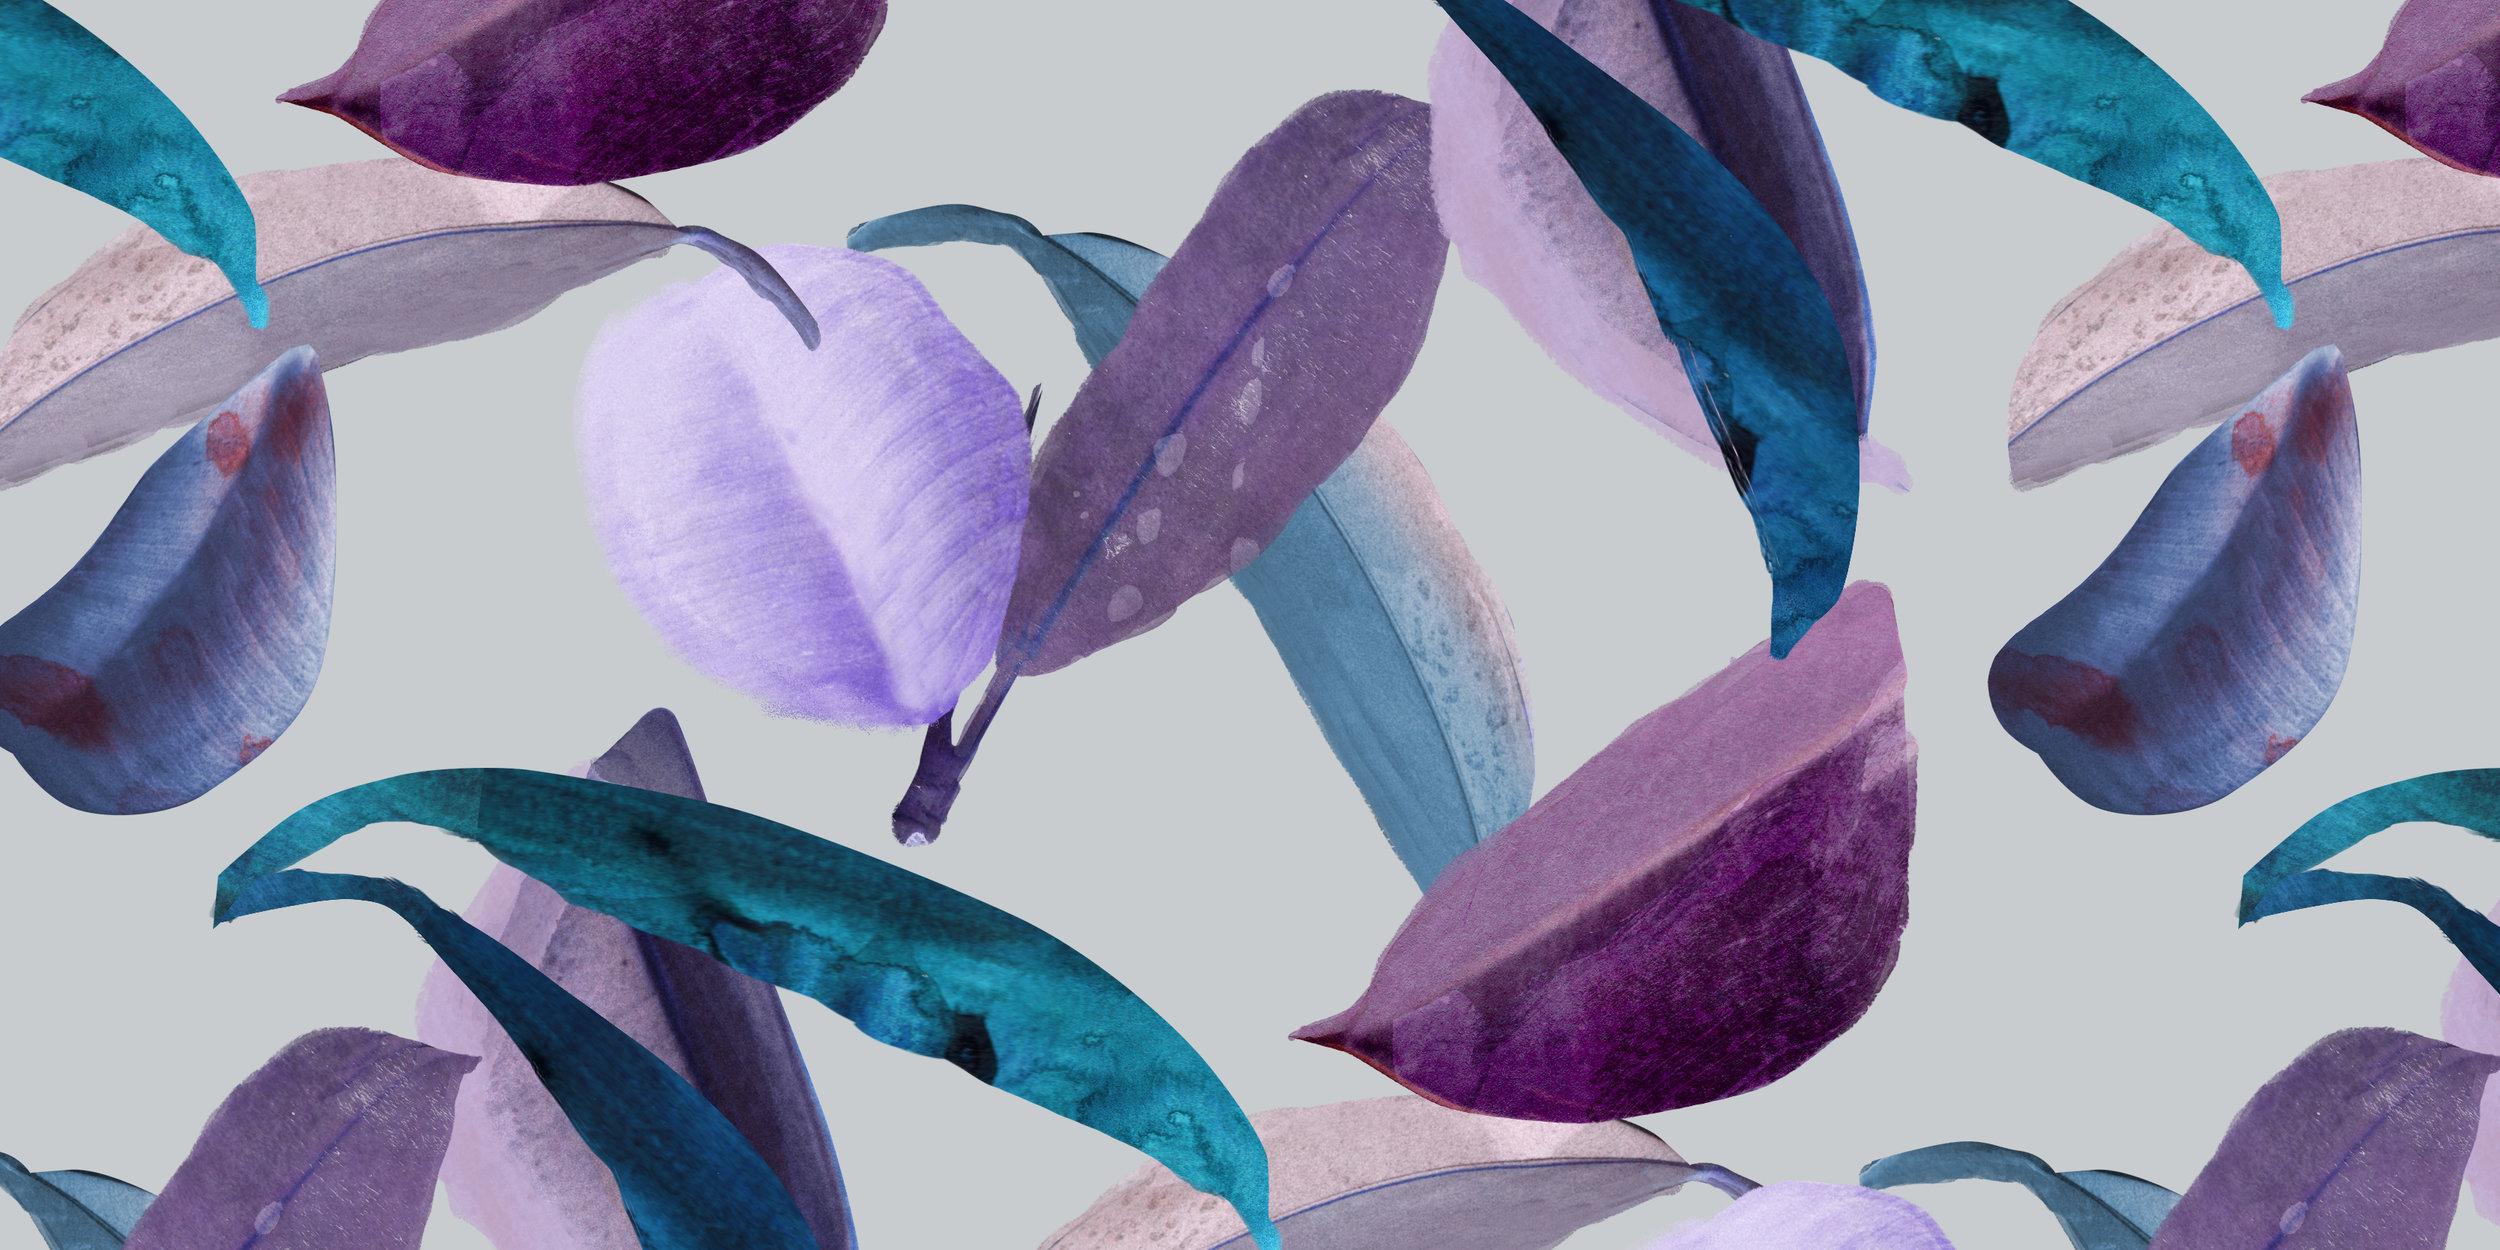 PatternsForWebsite_Wide_LeavesBlue.jpg